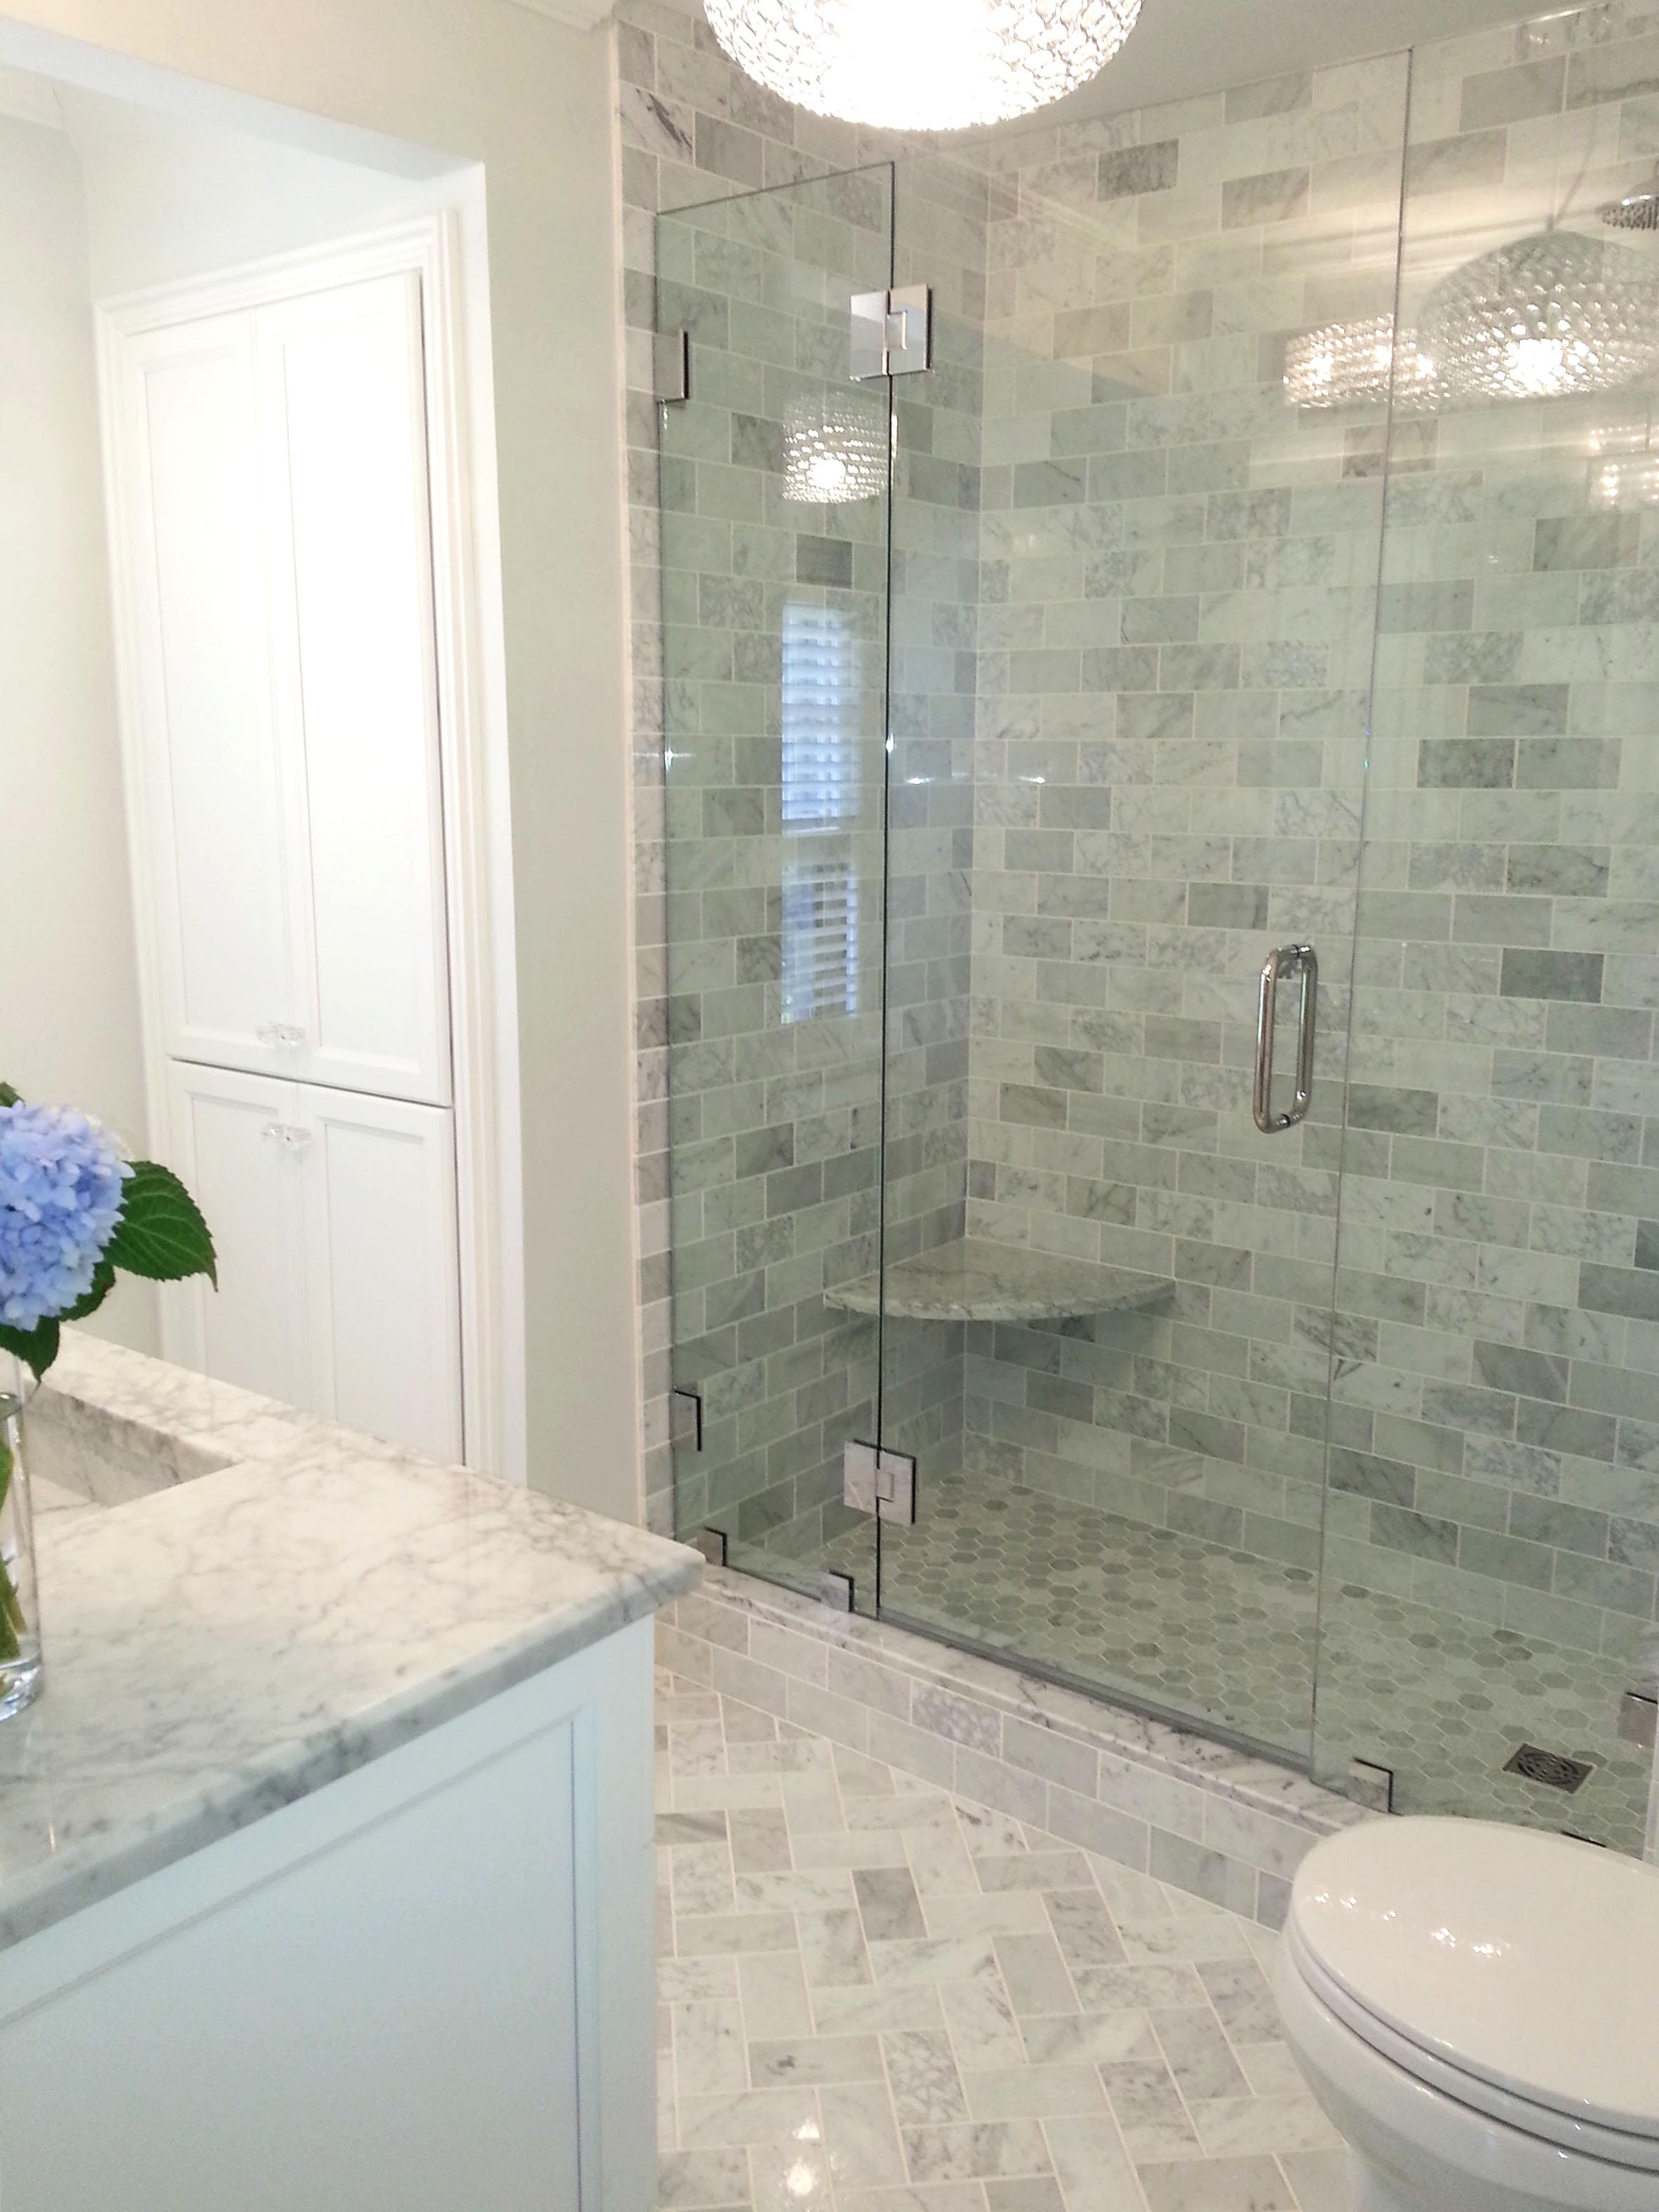 Hutch carrara bathroom 4.jpg